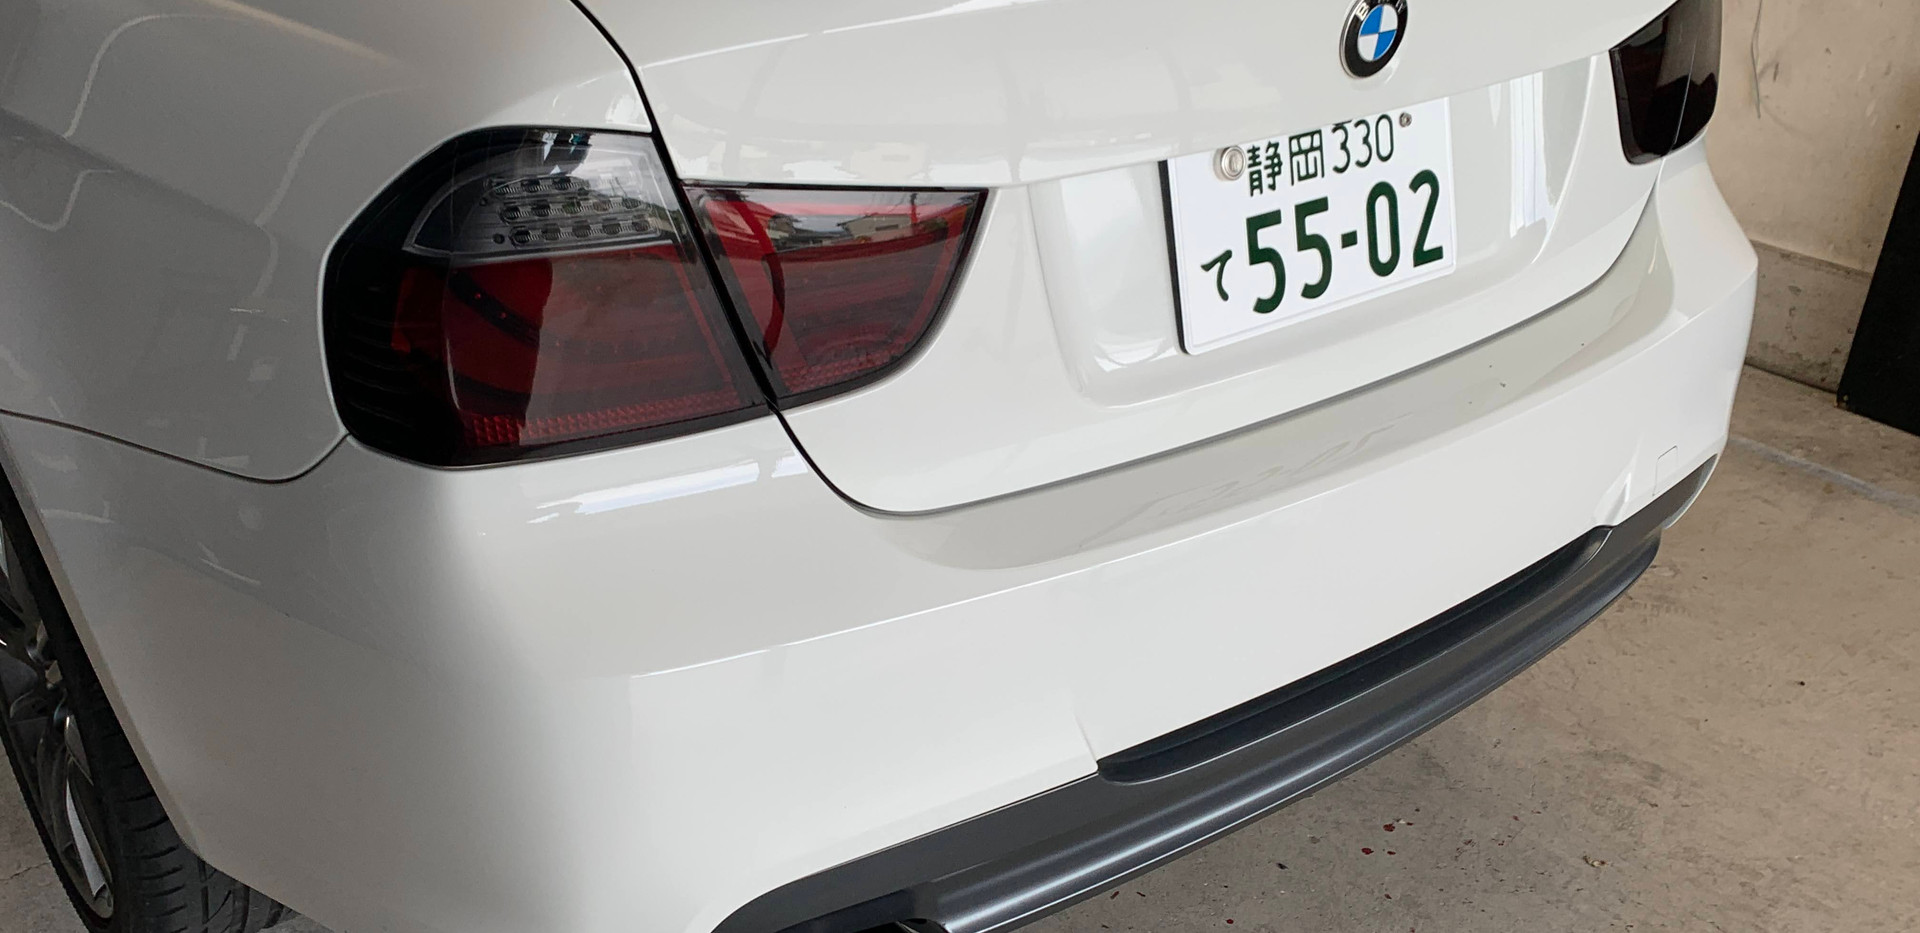 BMW 320i Mスポーツ E90 ワンオフマフラーカッター-①